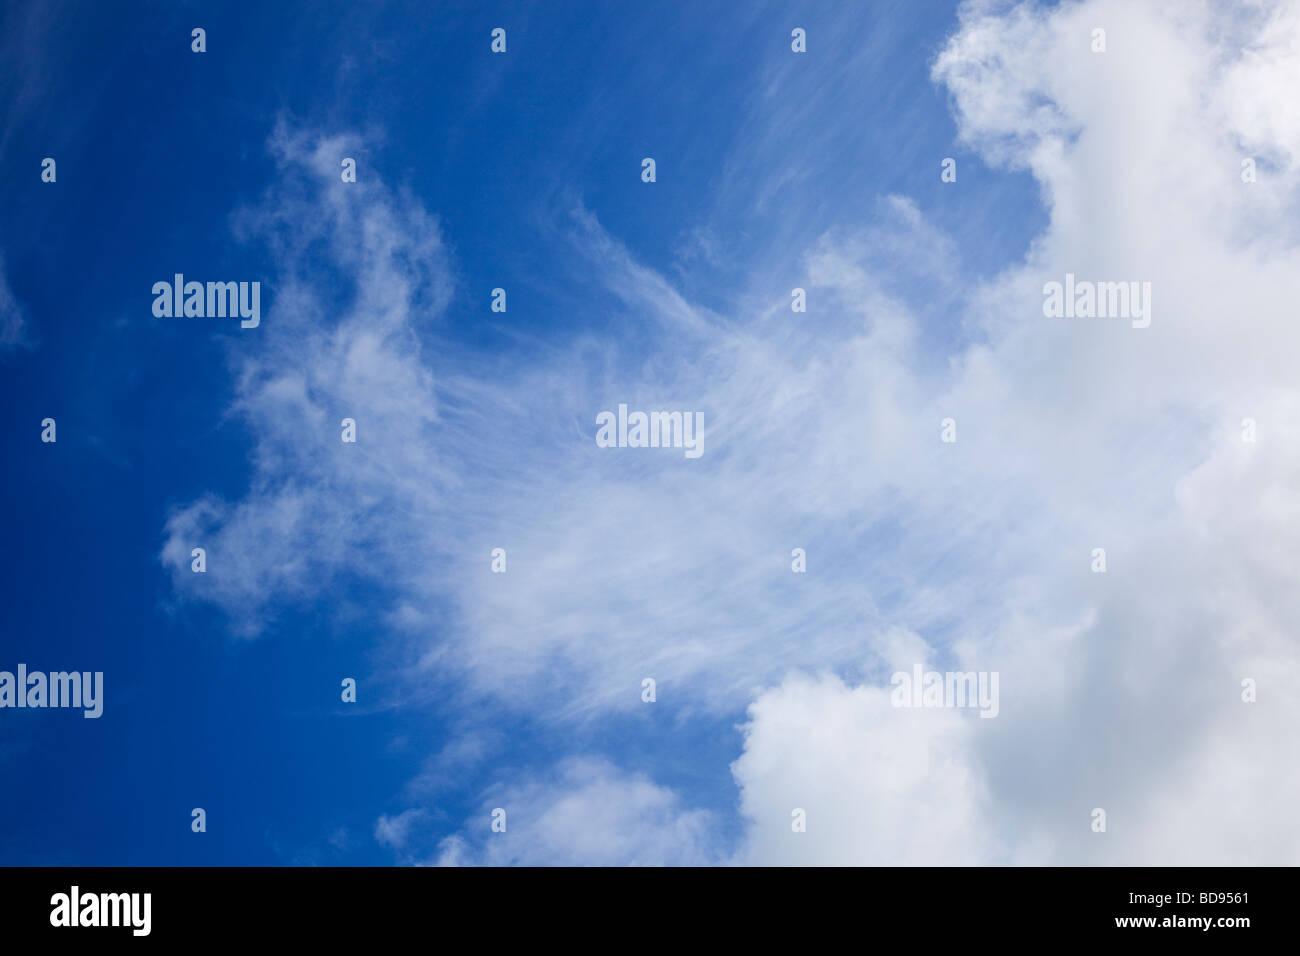 Ciel bleu avec des nuages cirrus looking up Photo Stock